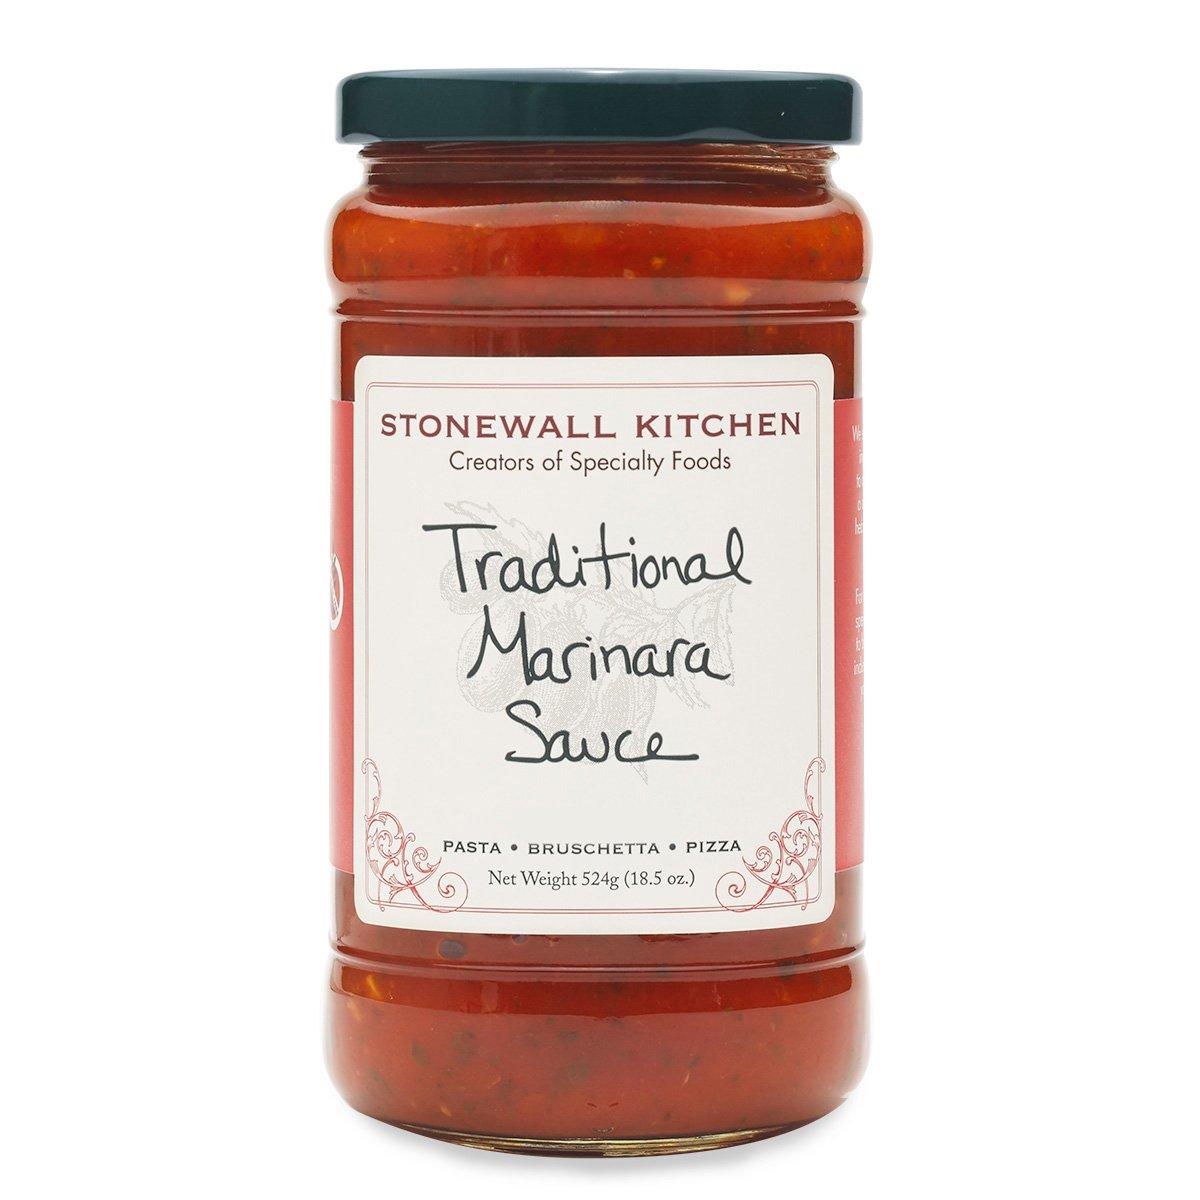 Stonewall Kitchen Traditional Marinara Sauce, 18.5 Ounces